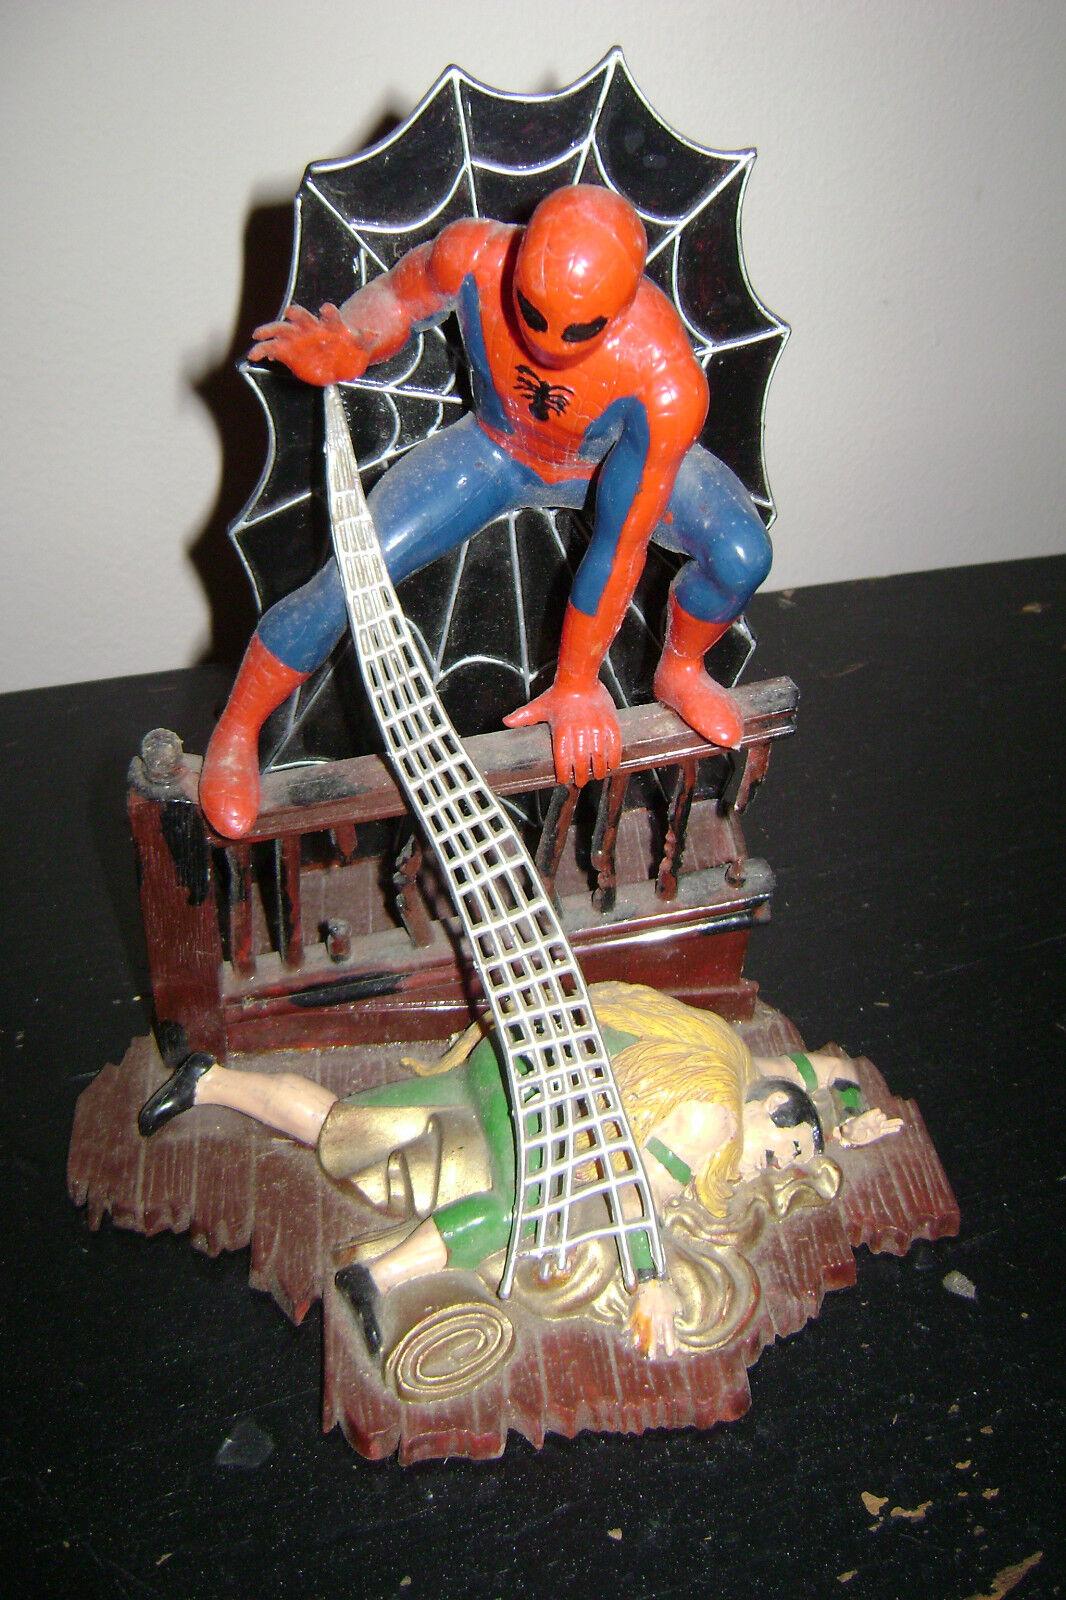 Das modell marvil comics spider - man